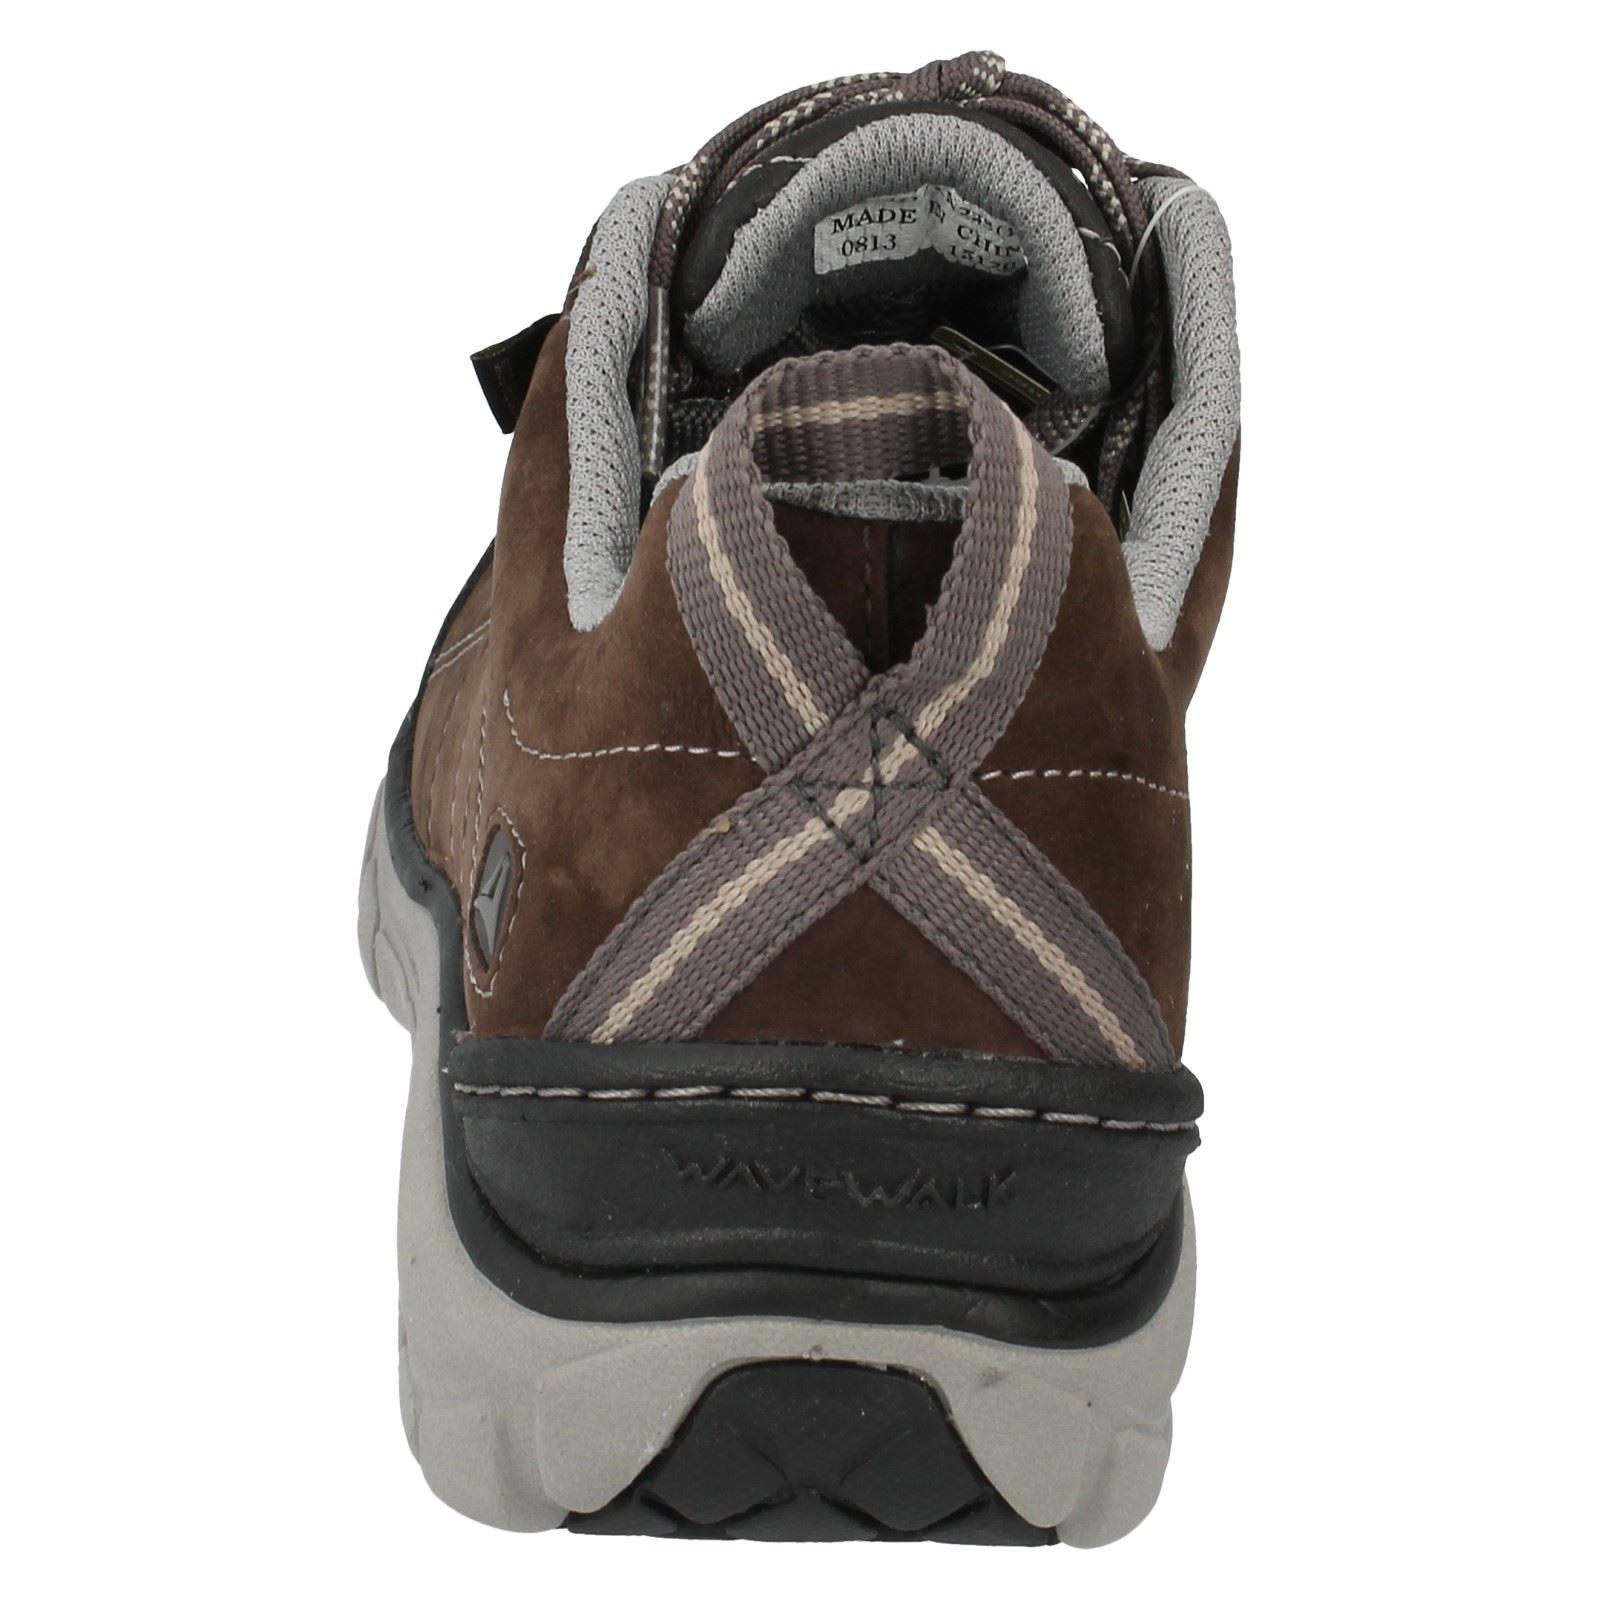 Onorevoli Clarks Scarpe Scarpe Scarpe Da Ginnastica Stile-WAVE Trail GTX 57af93